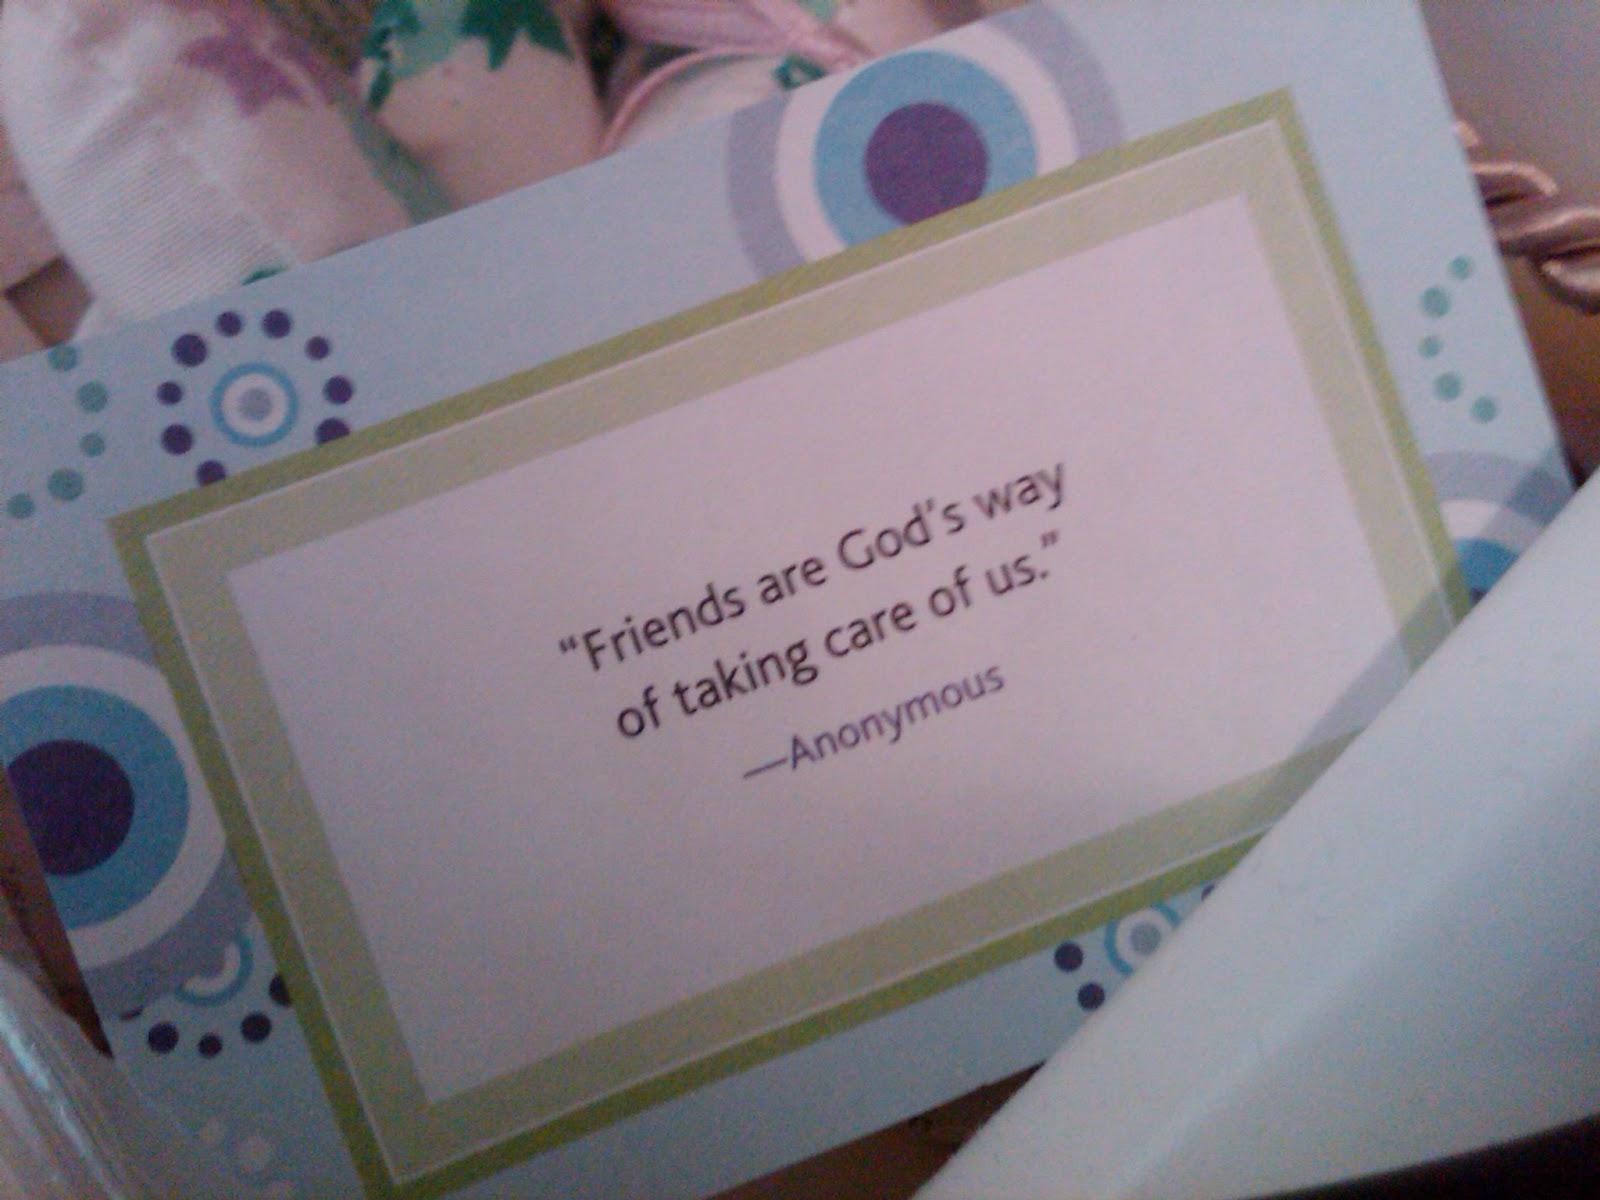 Facebook Defines Friends as